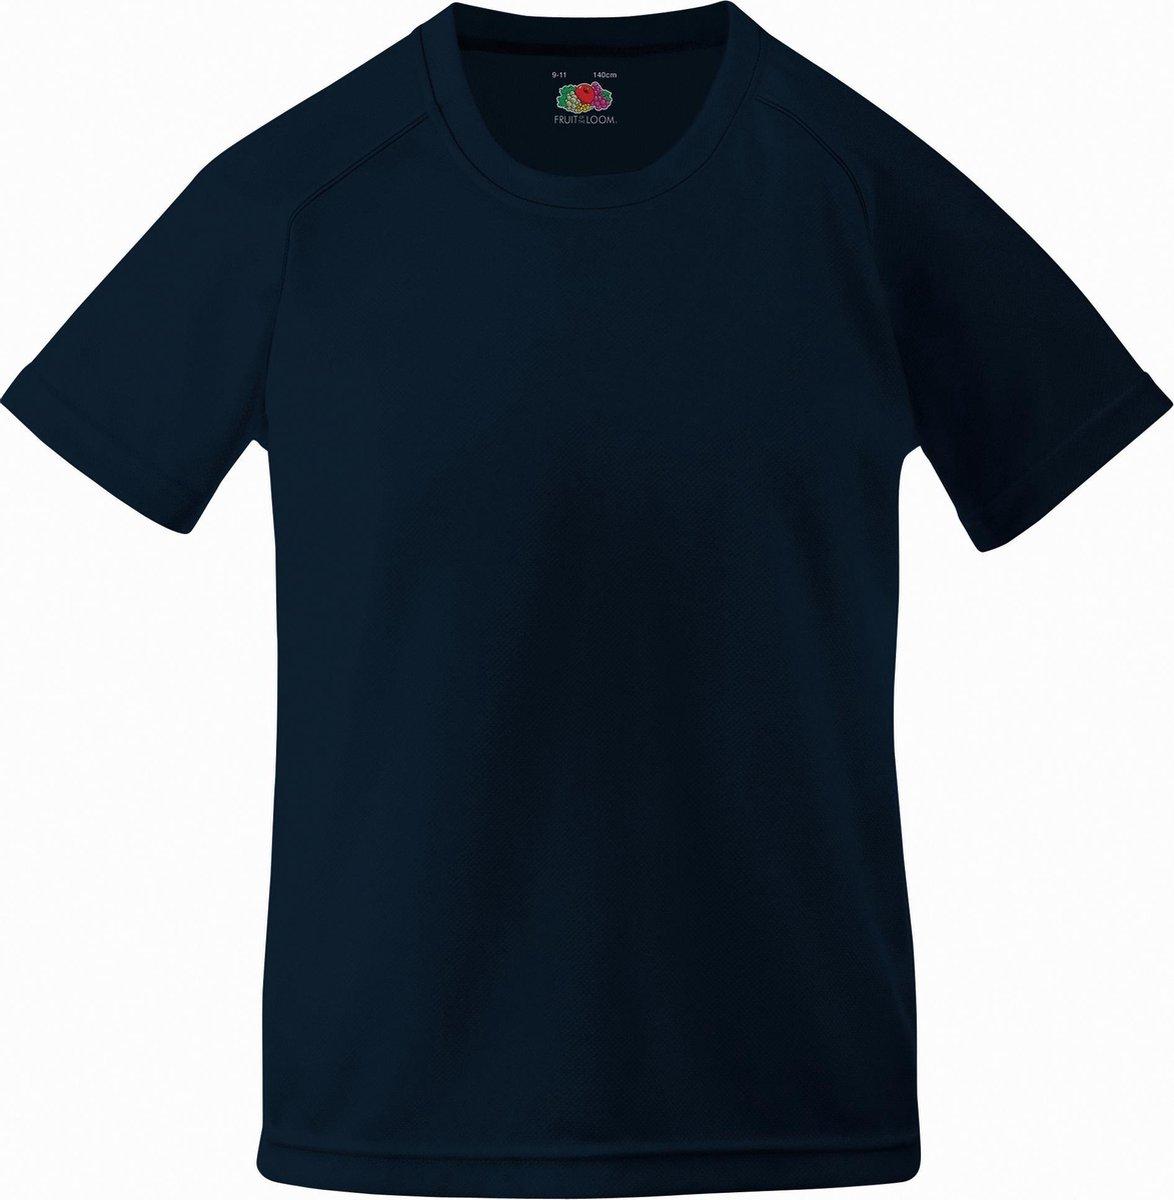 Fruit Of The Loom Kinder Unisex Performance Sportskleding T-shirt (Diep Marine)